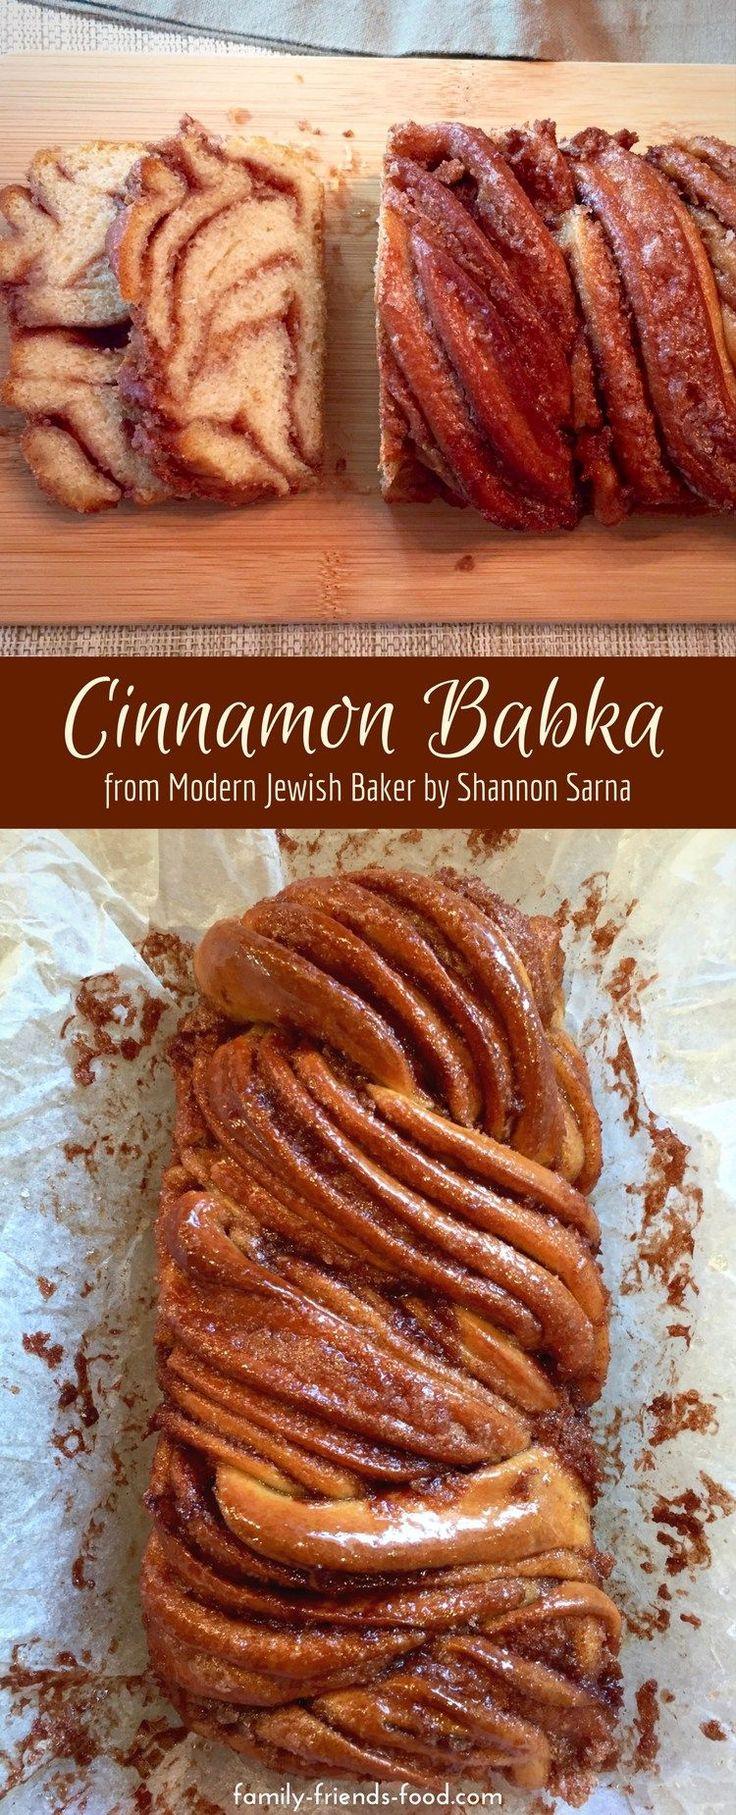 The 513 best rosh hashanah images on pinterest dinner table sweet delicious gooey cinnamon babka recipe taken from shannon sarnas book modern jewish fandeluxe Images